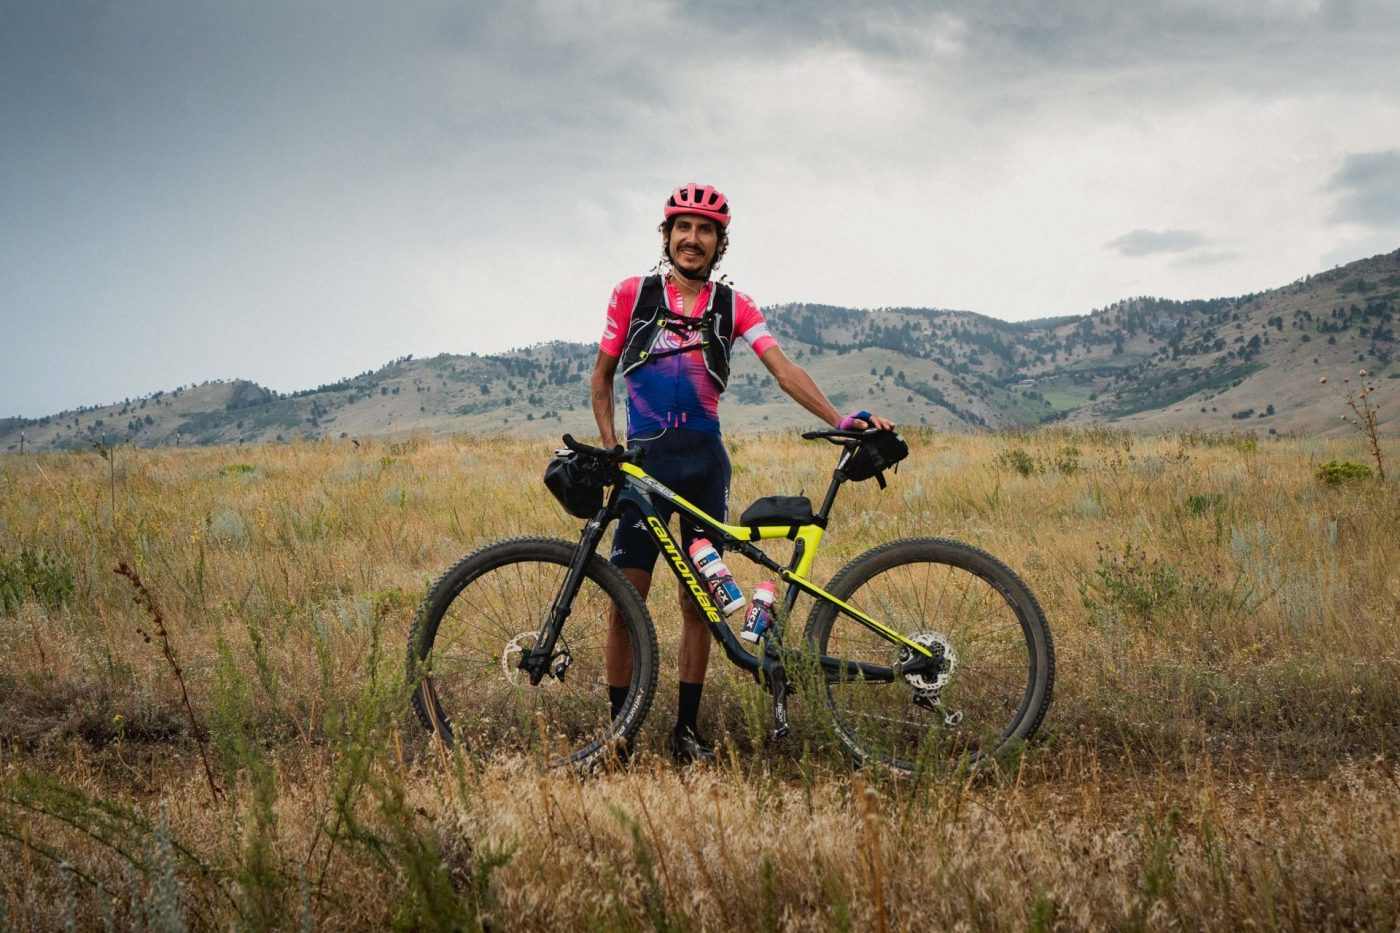 Lachlan Morton Finishes Colorado Trail in Under Four Days 3